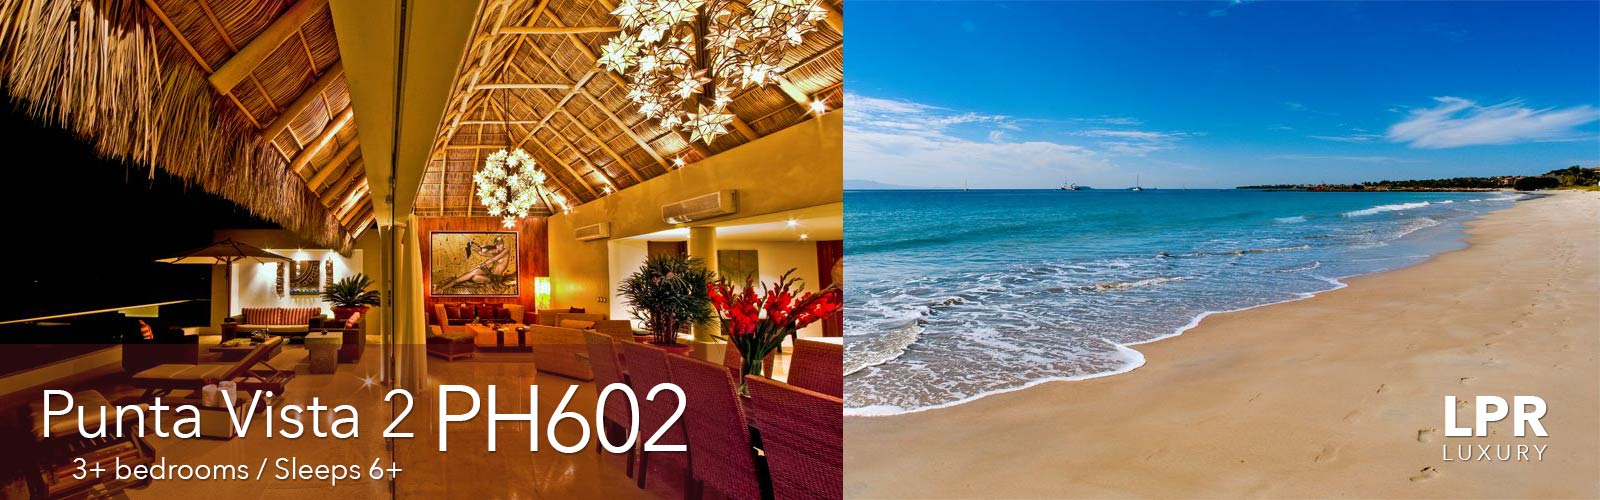 Punta Vista 2 - Penthouse 602 - Luxury Punta de Mita Vacation Rentals - Puerto Vallarta